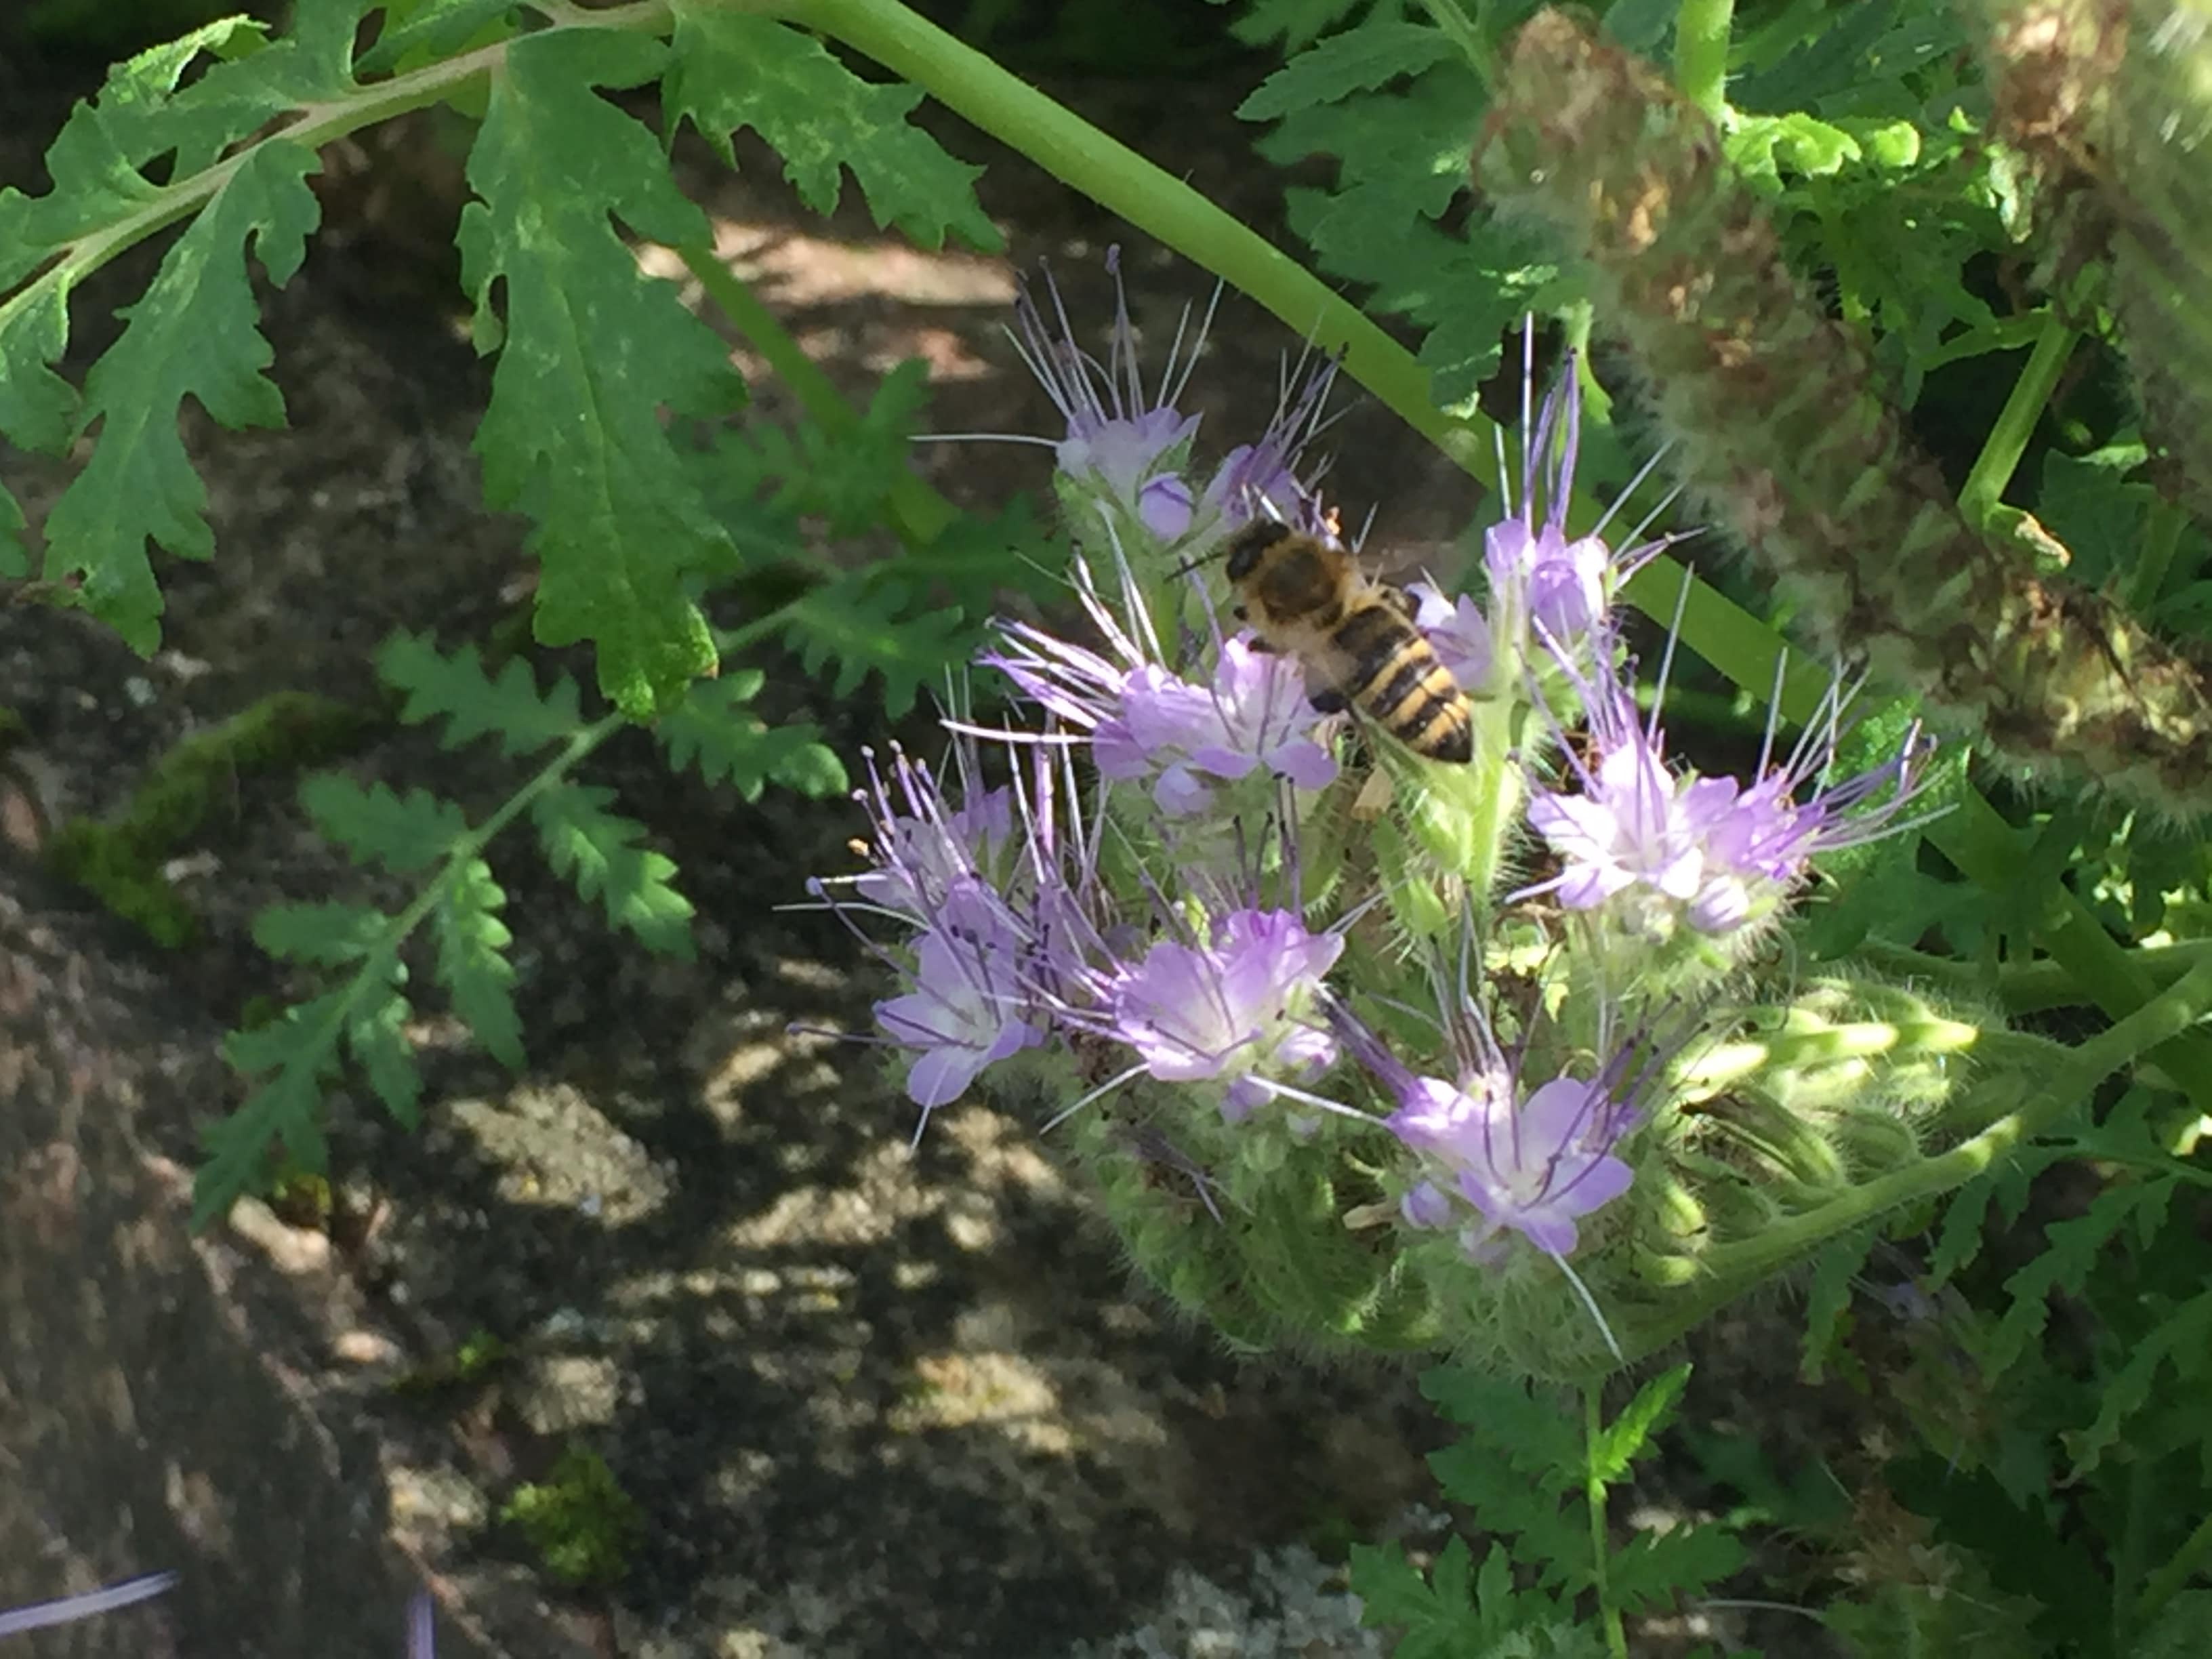 Bienenstockluft bei folgenden Erkankungen